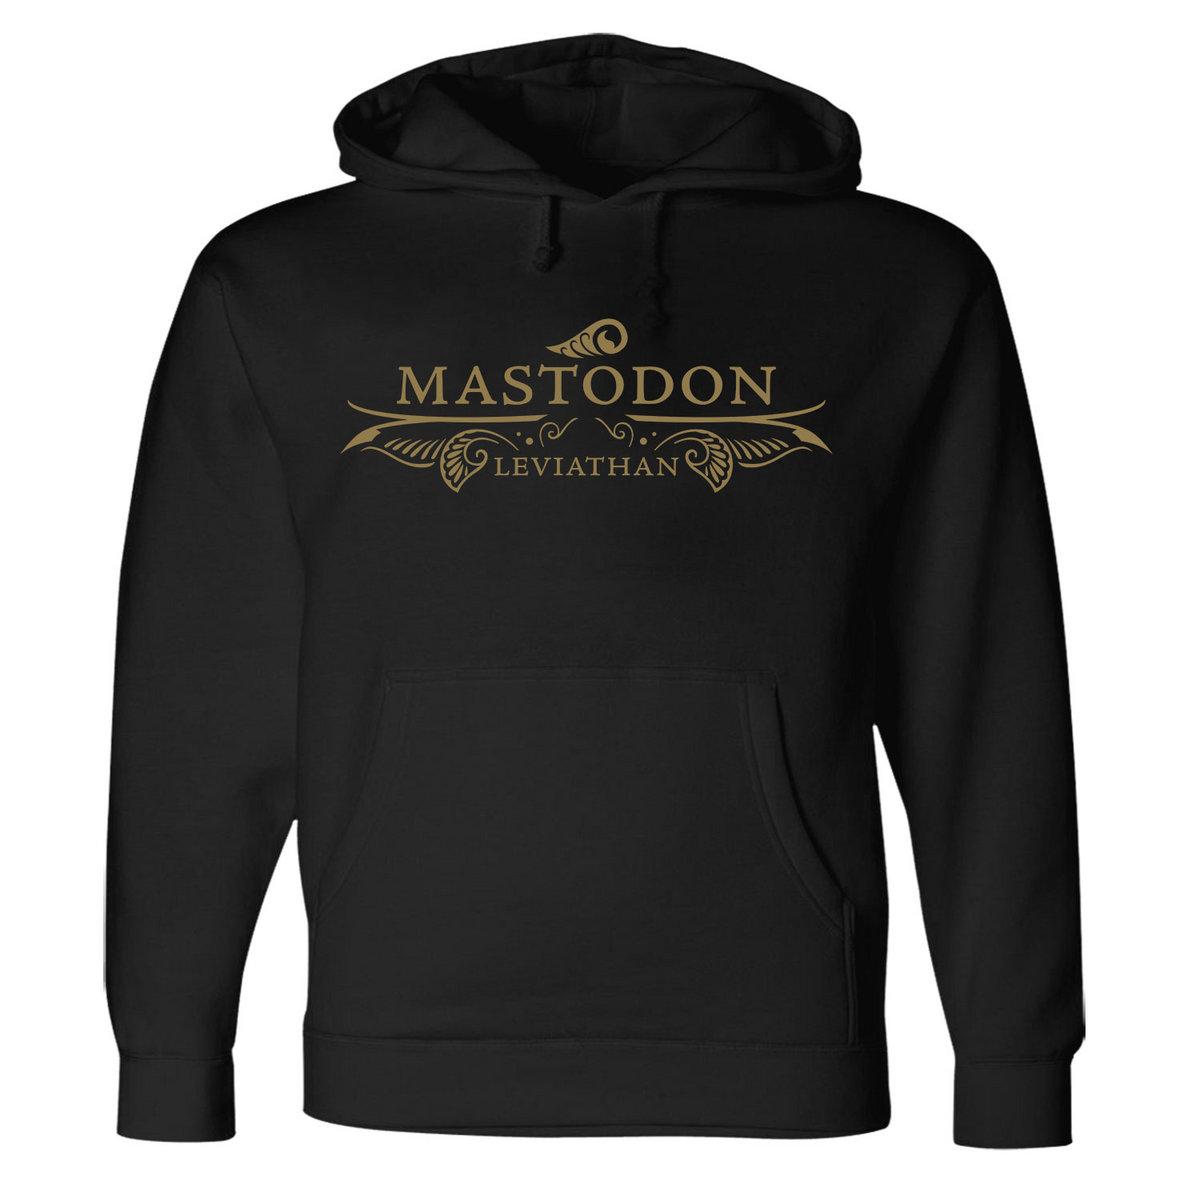 621c323d4 Mastodon - Logo (Leviathan) Pullover Hoodie. T-Shirt/Apparel + Digital Album